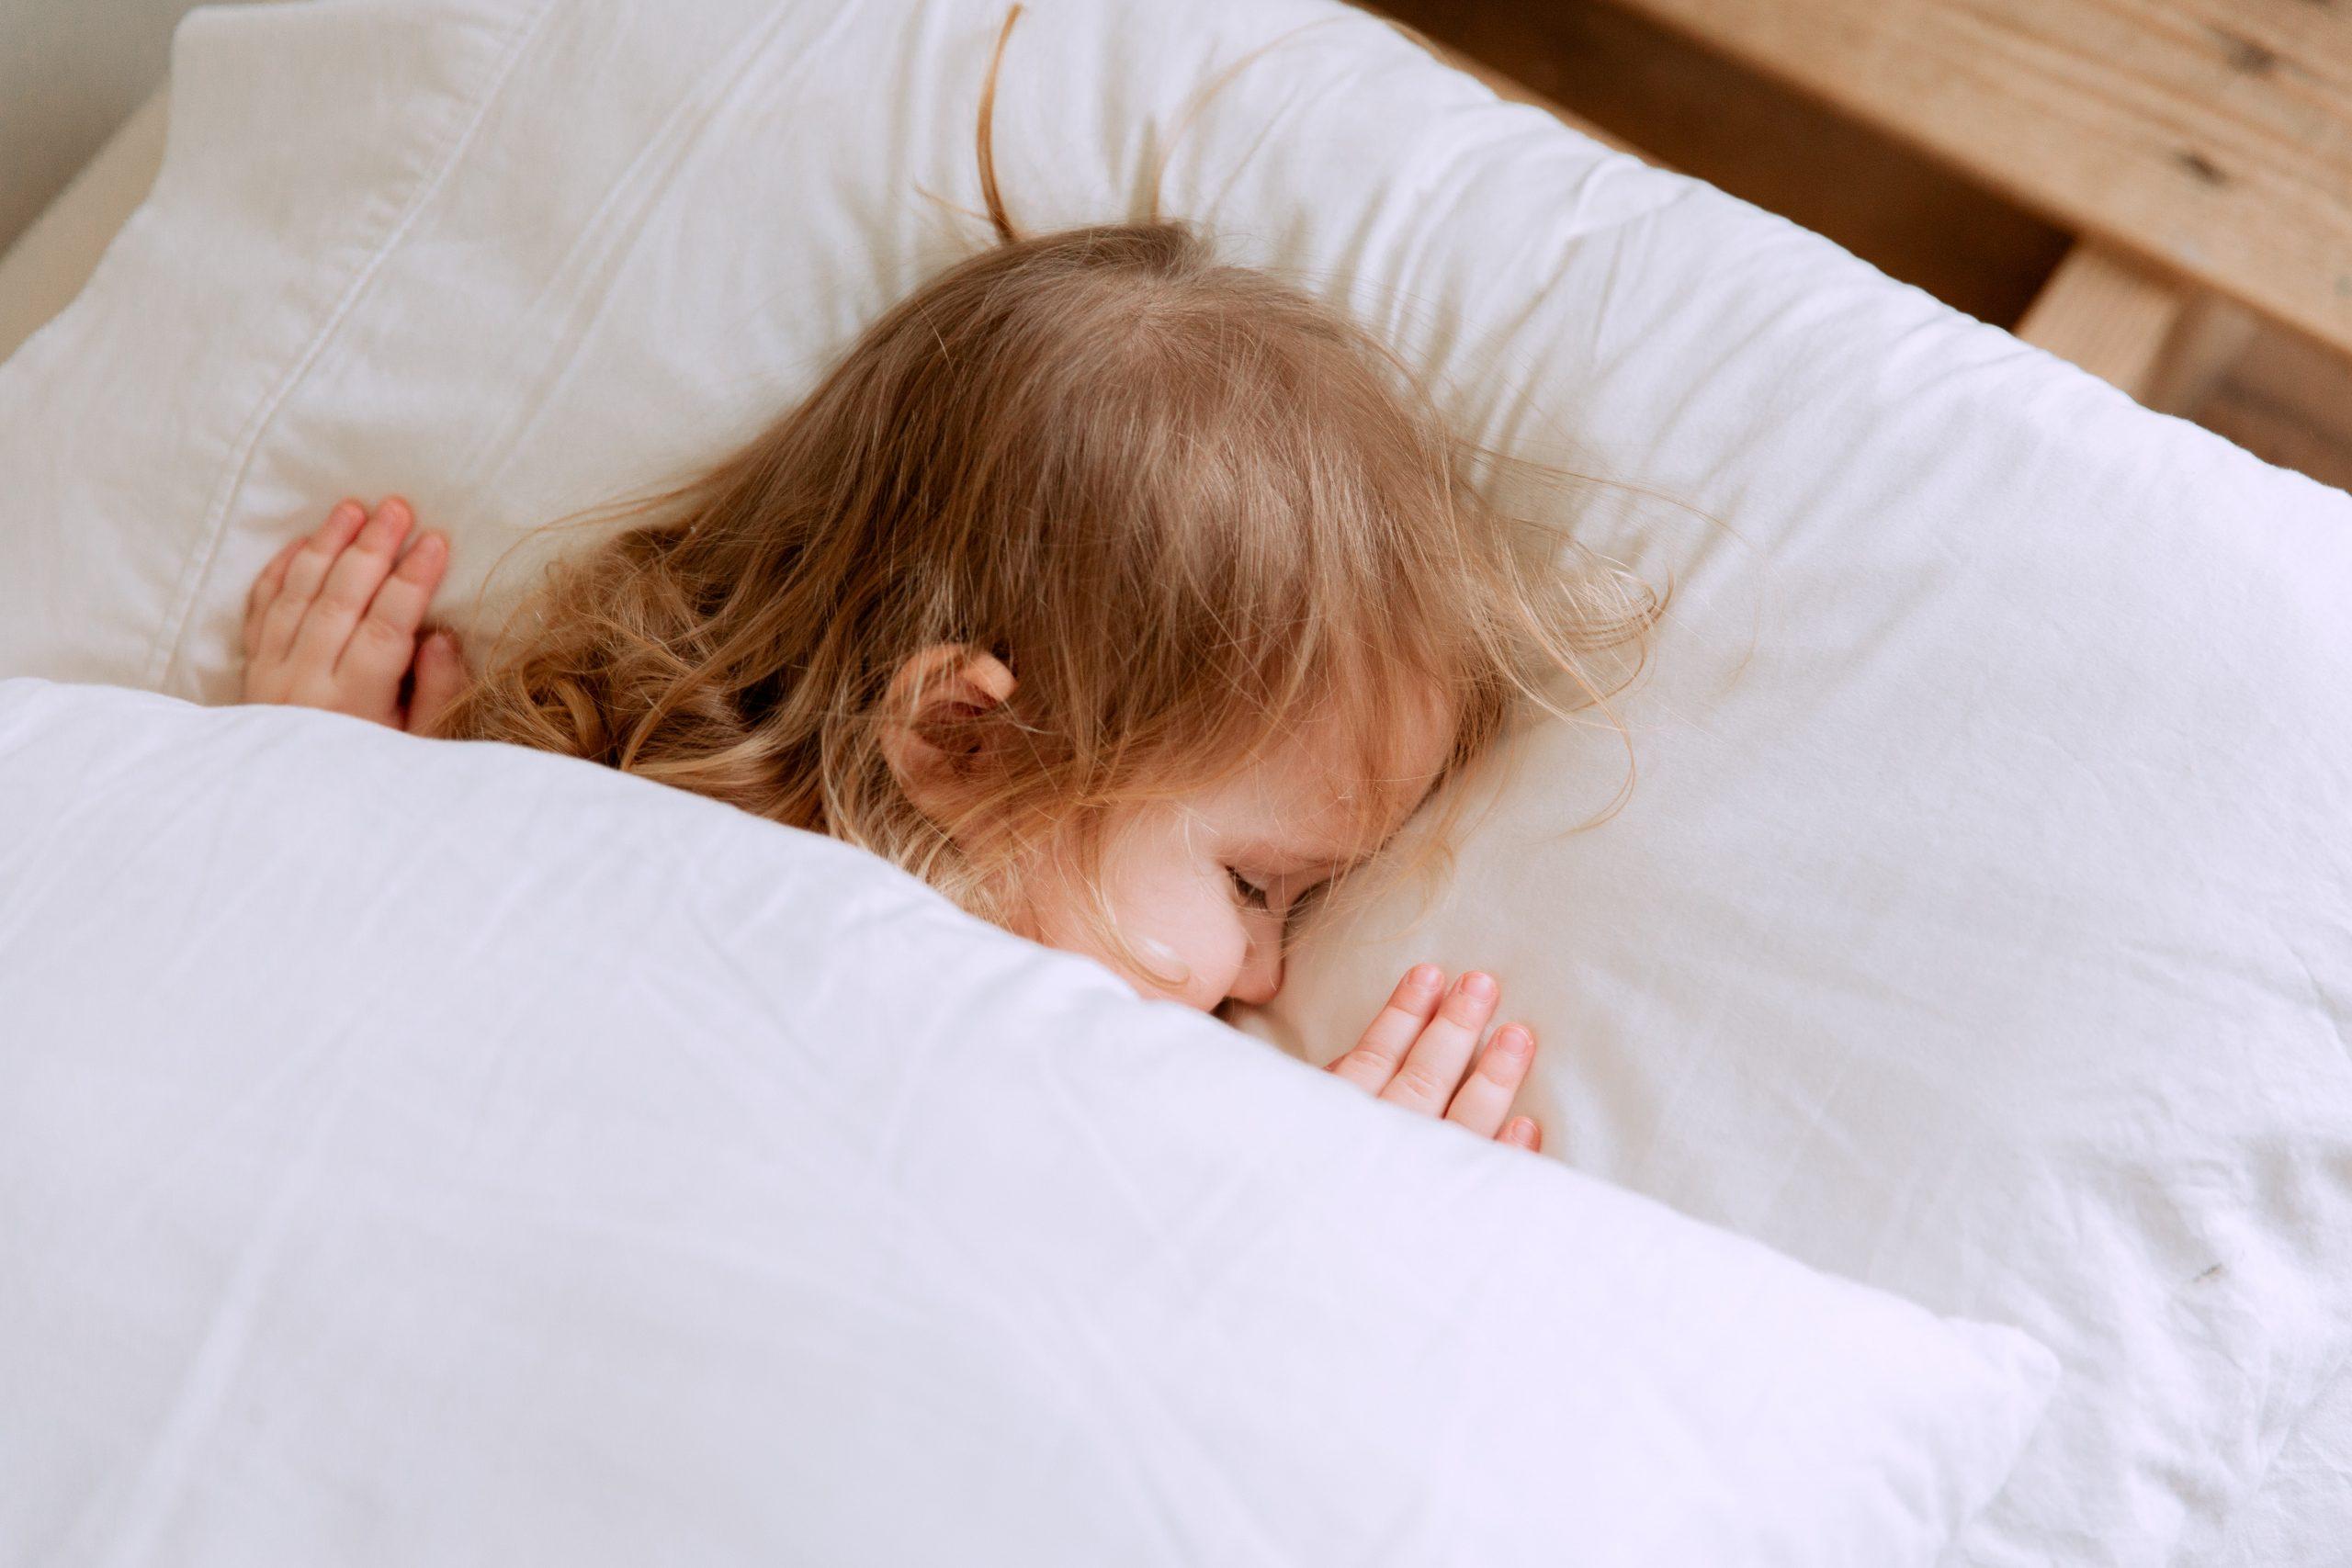 Sleeping toddler in bed